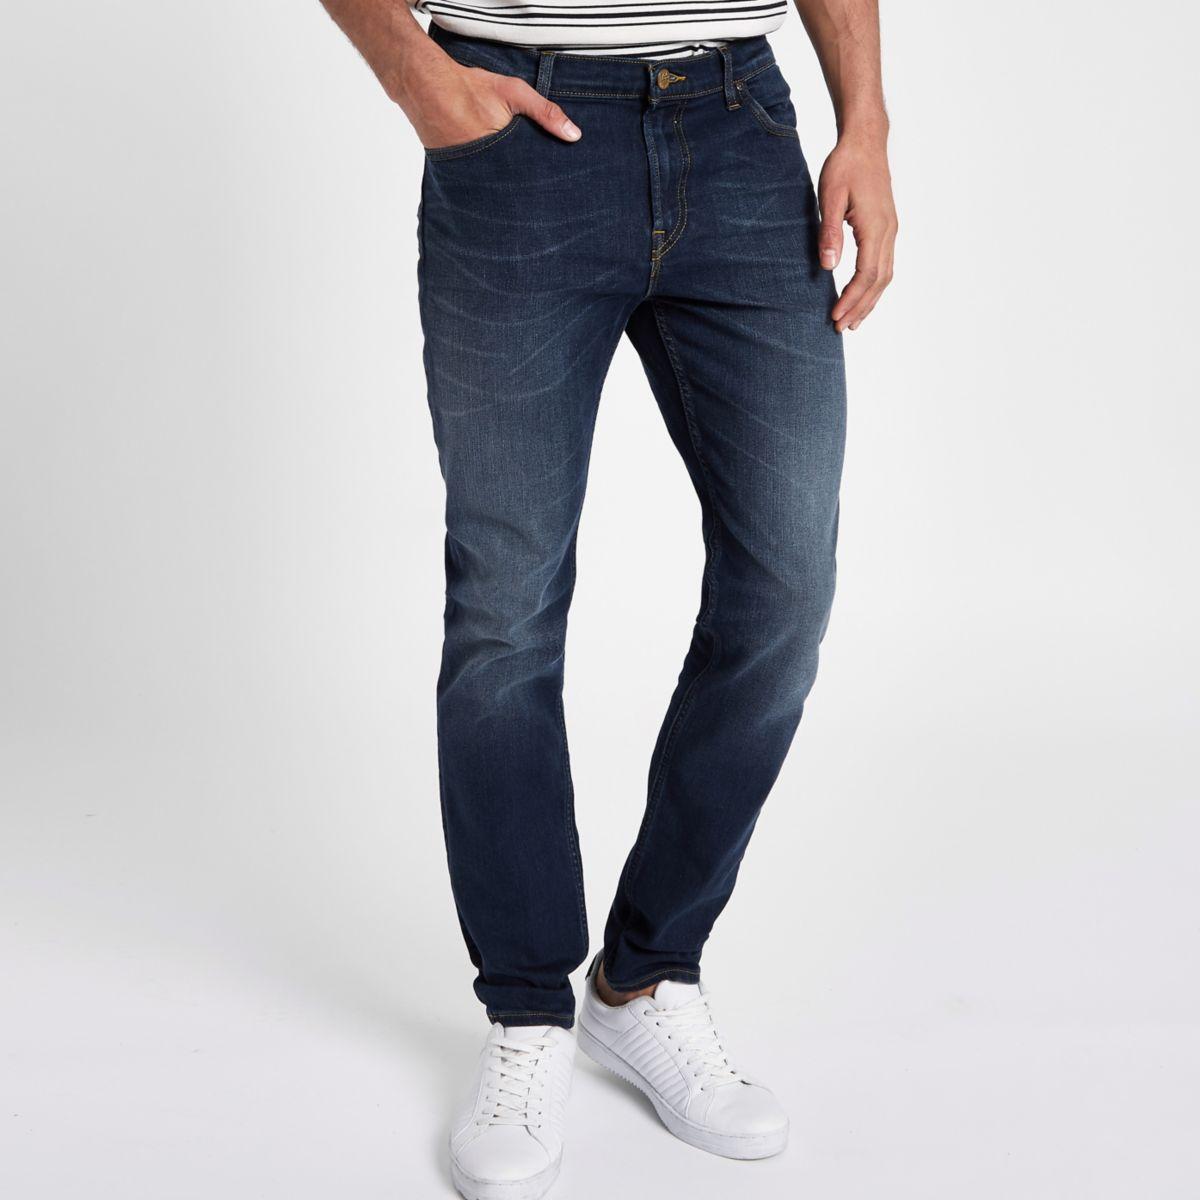 Blue Lee Rider slim fit jeans